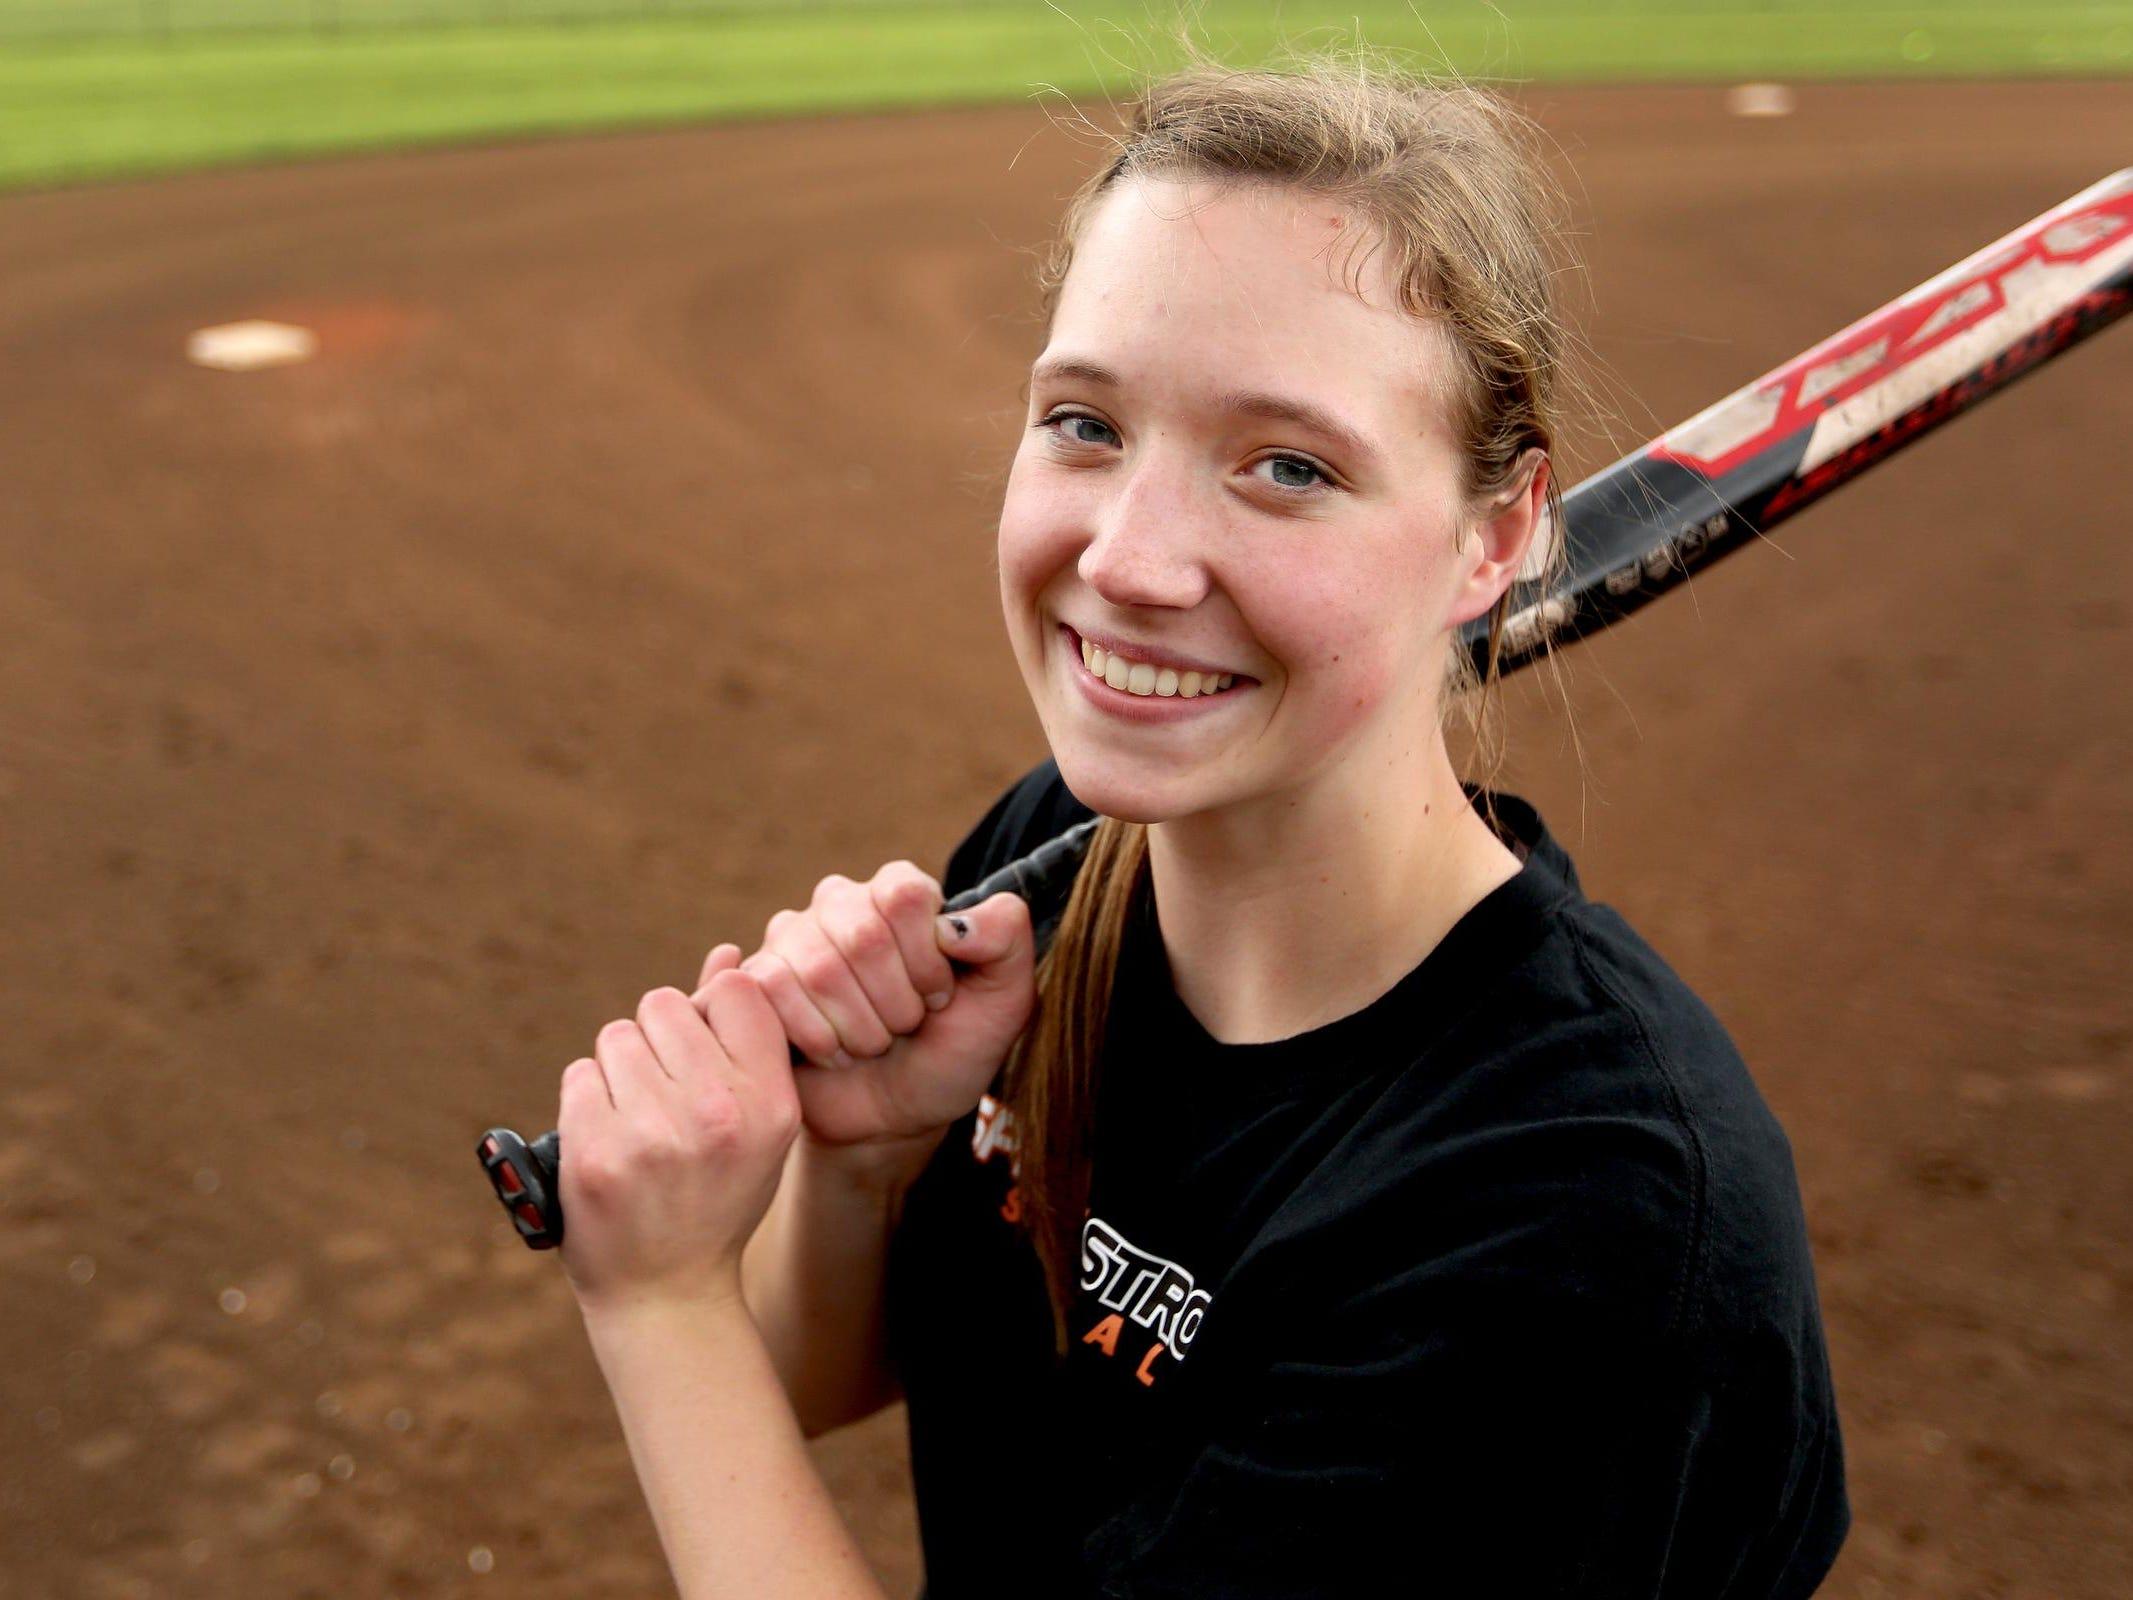 Senior catcher Jessie Isham was named CBS MaxPreps All-American first-team